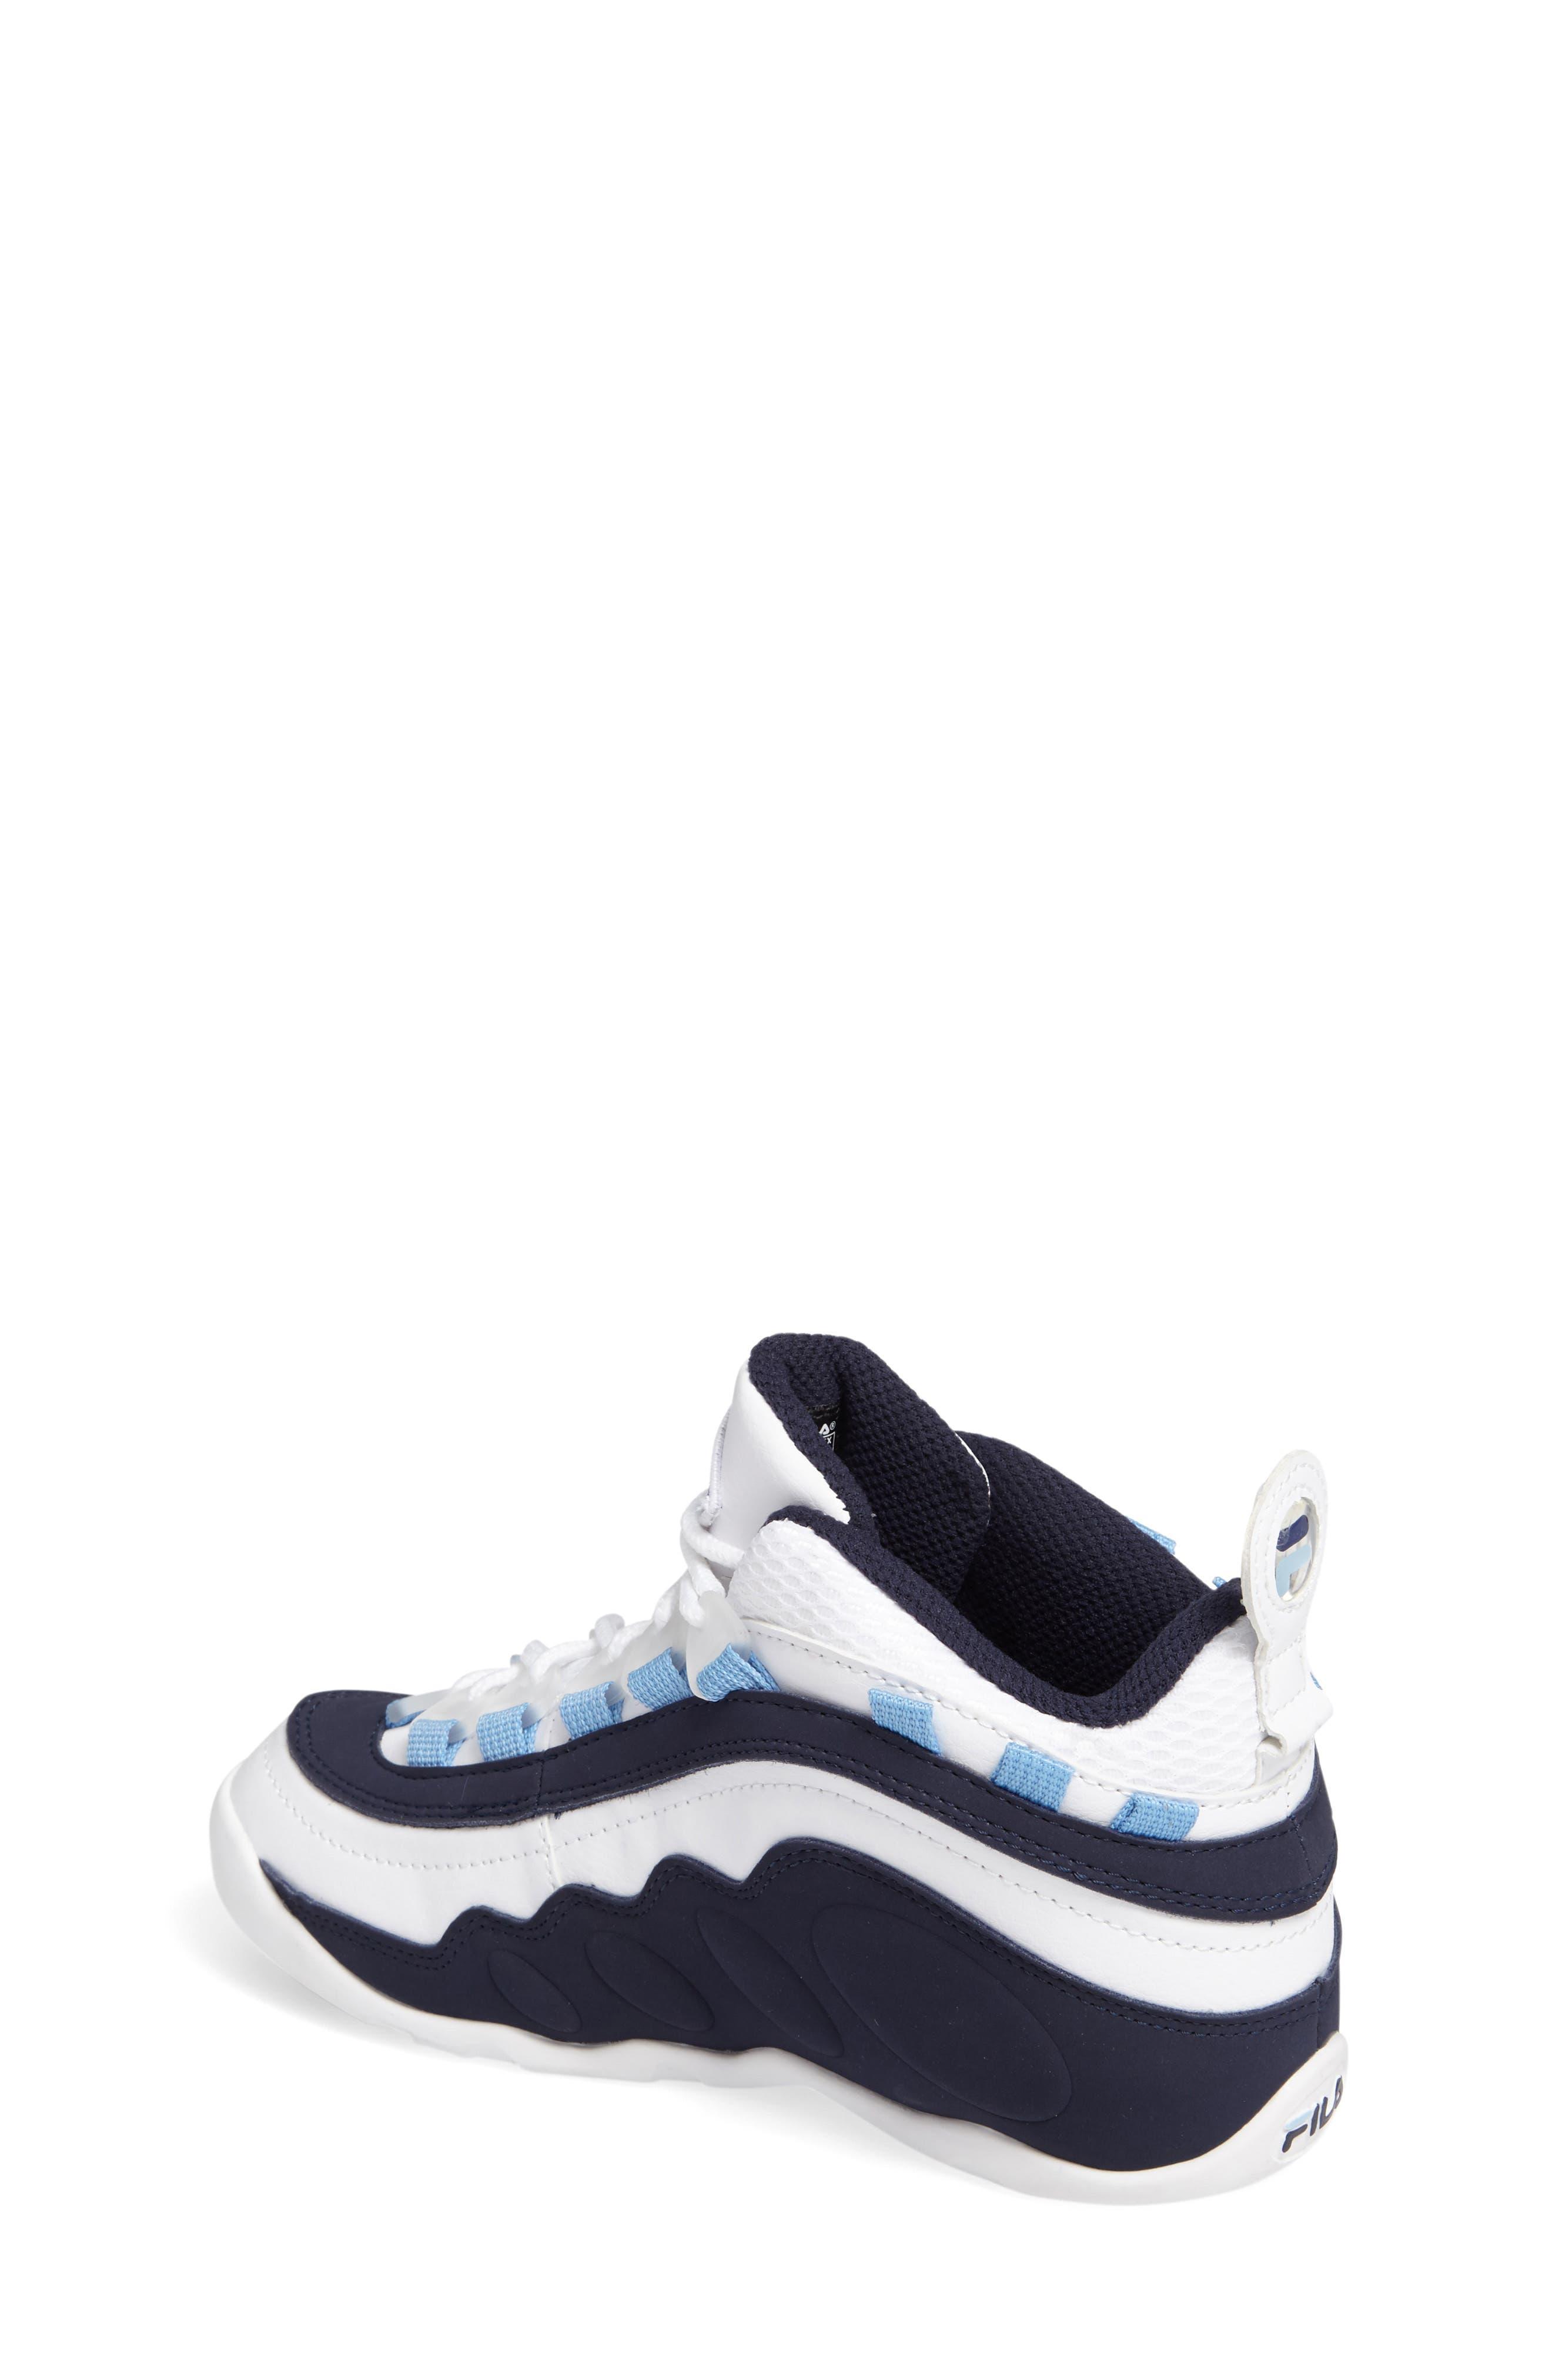 Bubbles Mid Top Sneaker,                             Alternate thumbnail 2, color,                             147